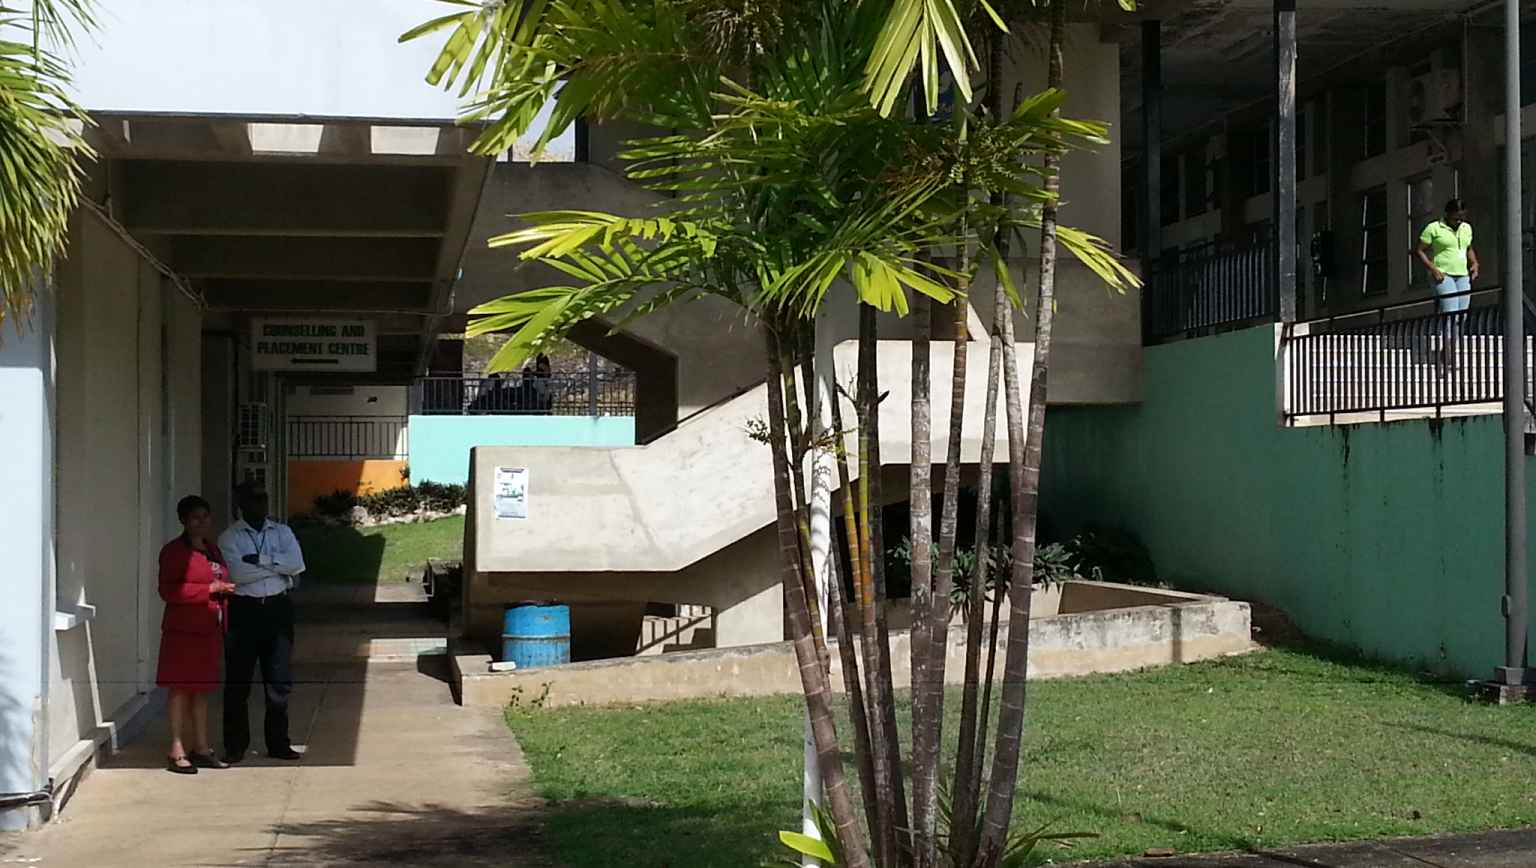 EducationUSA Advising Center at Barbados Community College